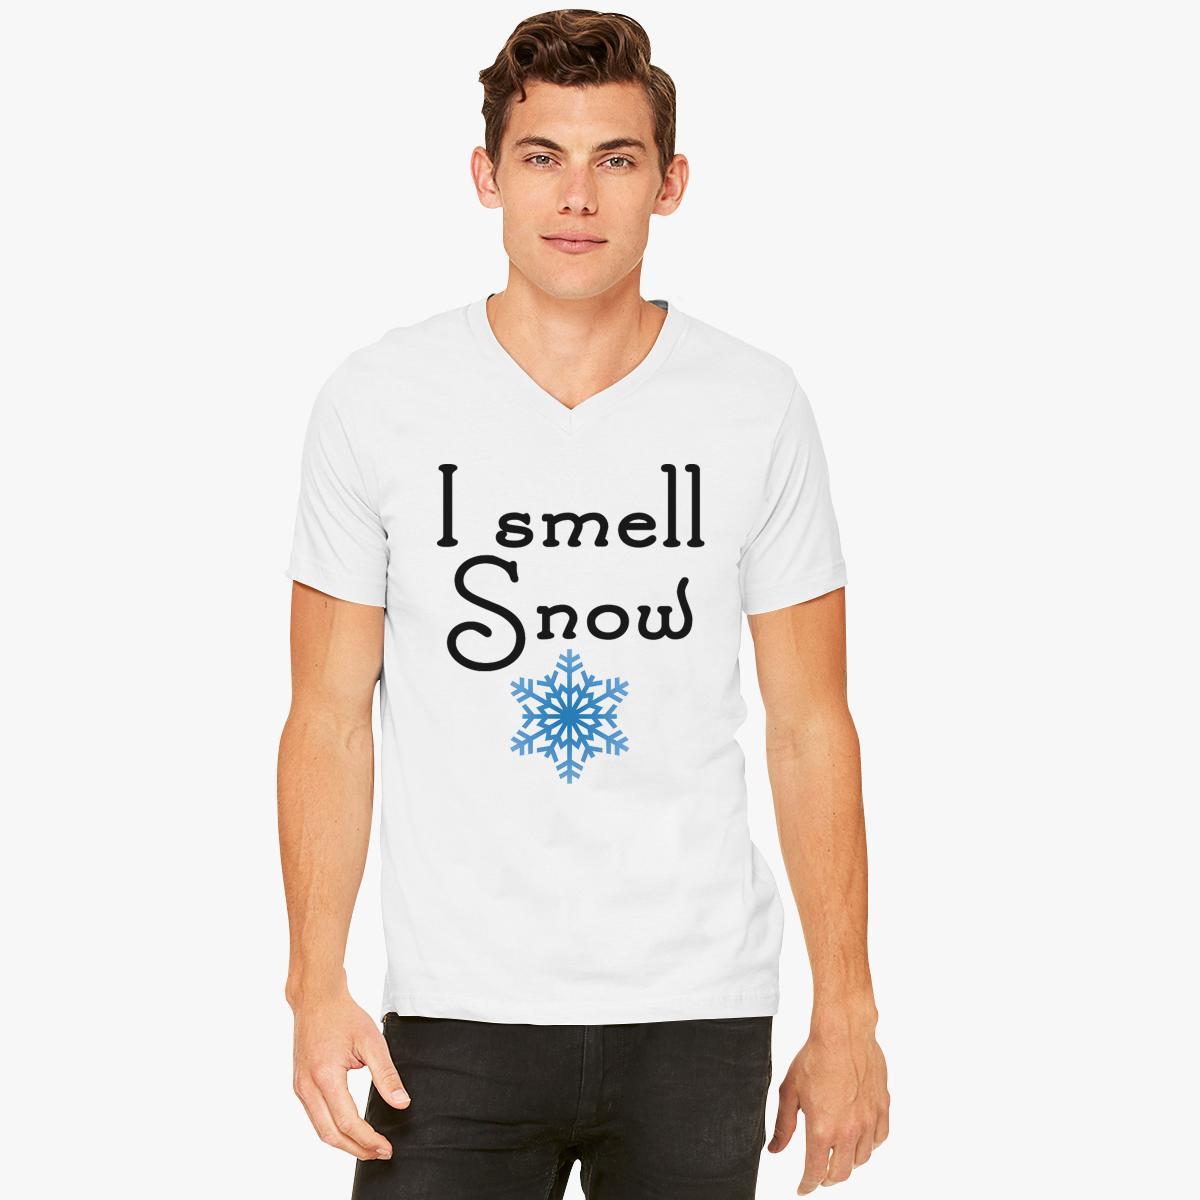 Gilmore Girls - I smell Snow  V-Neck T-shirt